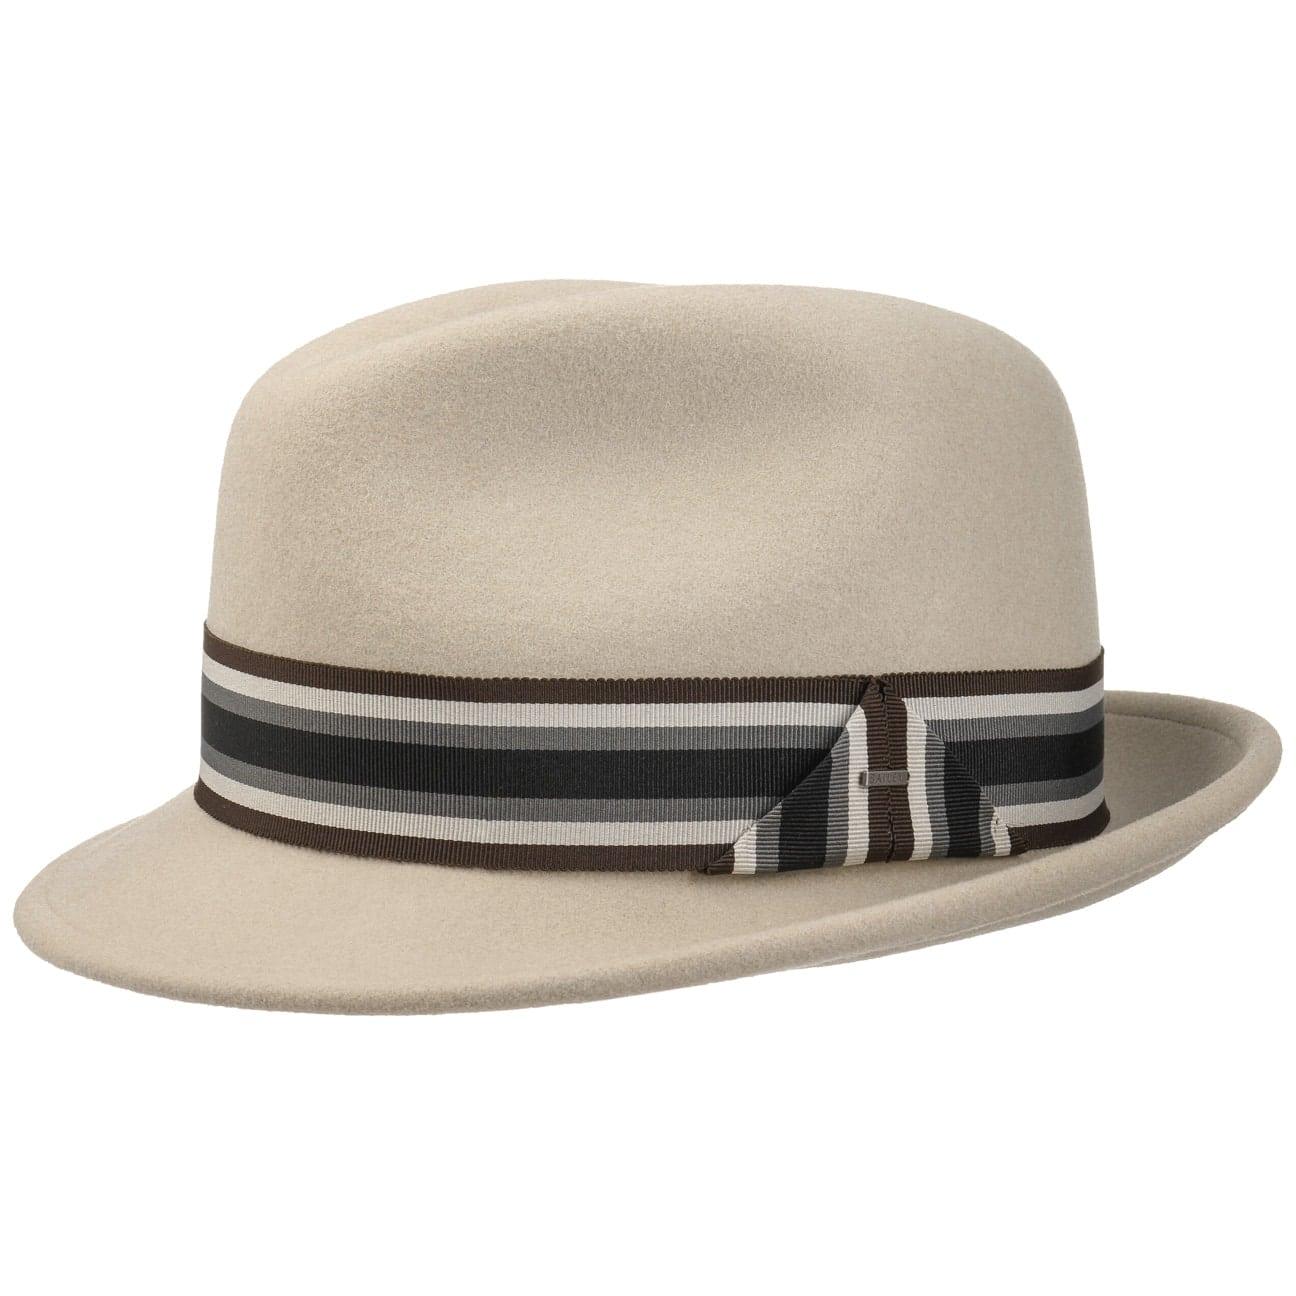 Sombrero Goldring by Bailey of Hollywood  sombrero de hombre